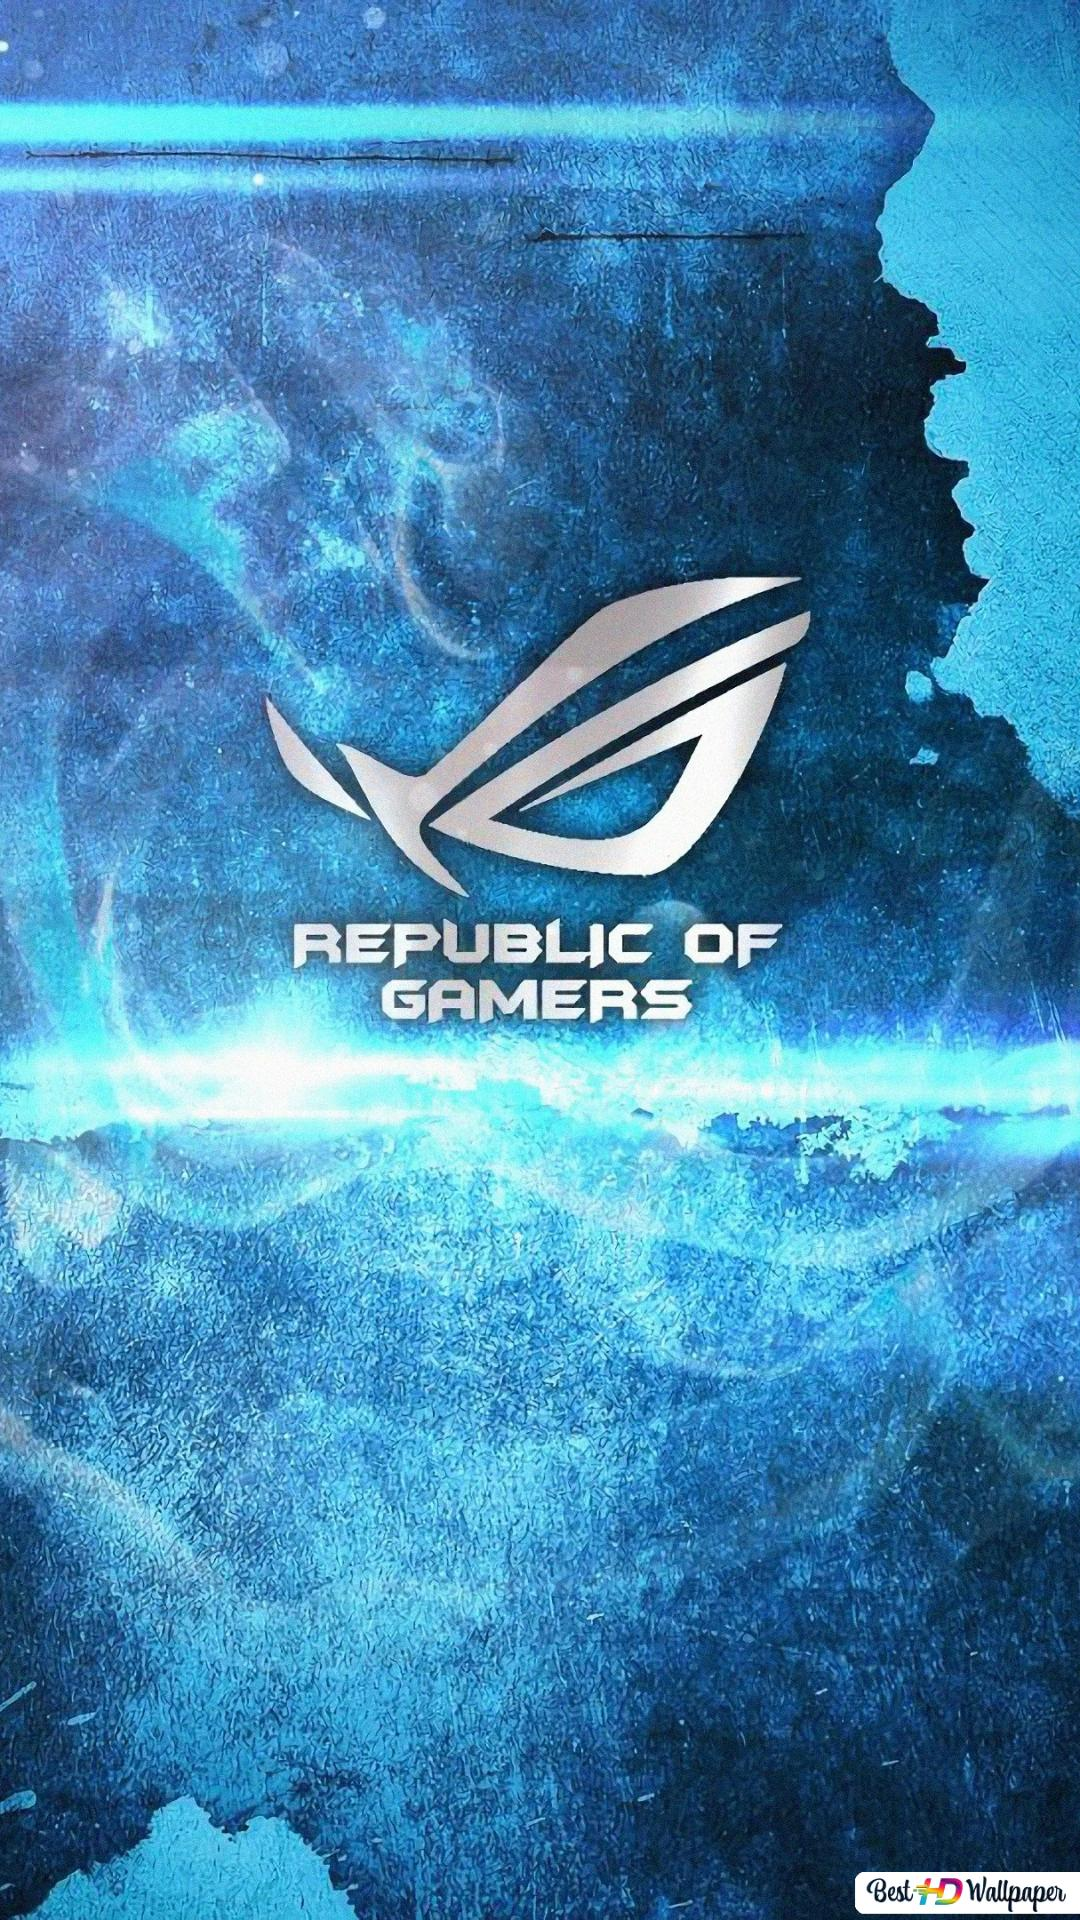 ASUS ROG Republic Of Gamers Logo Blue HD Wallpaper